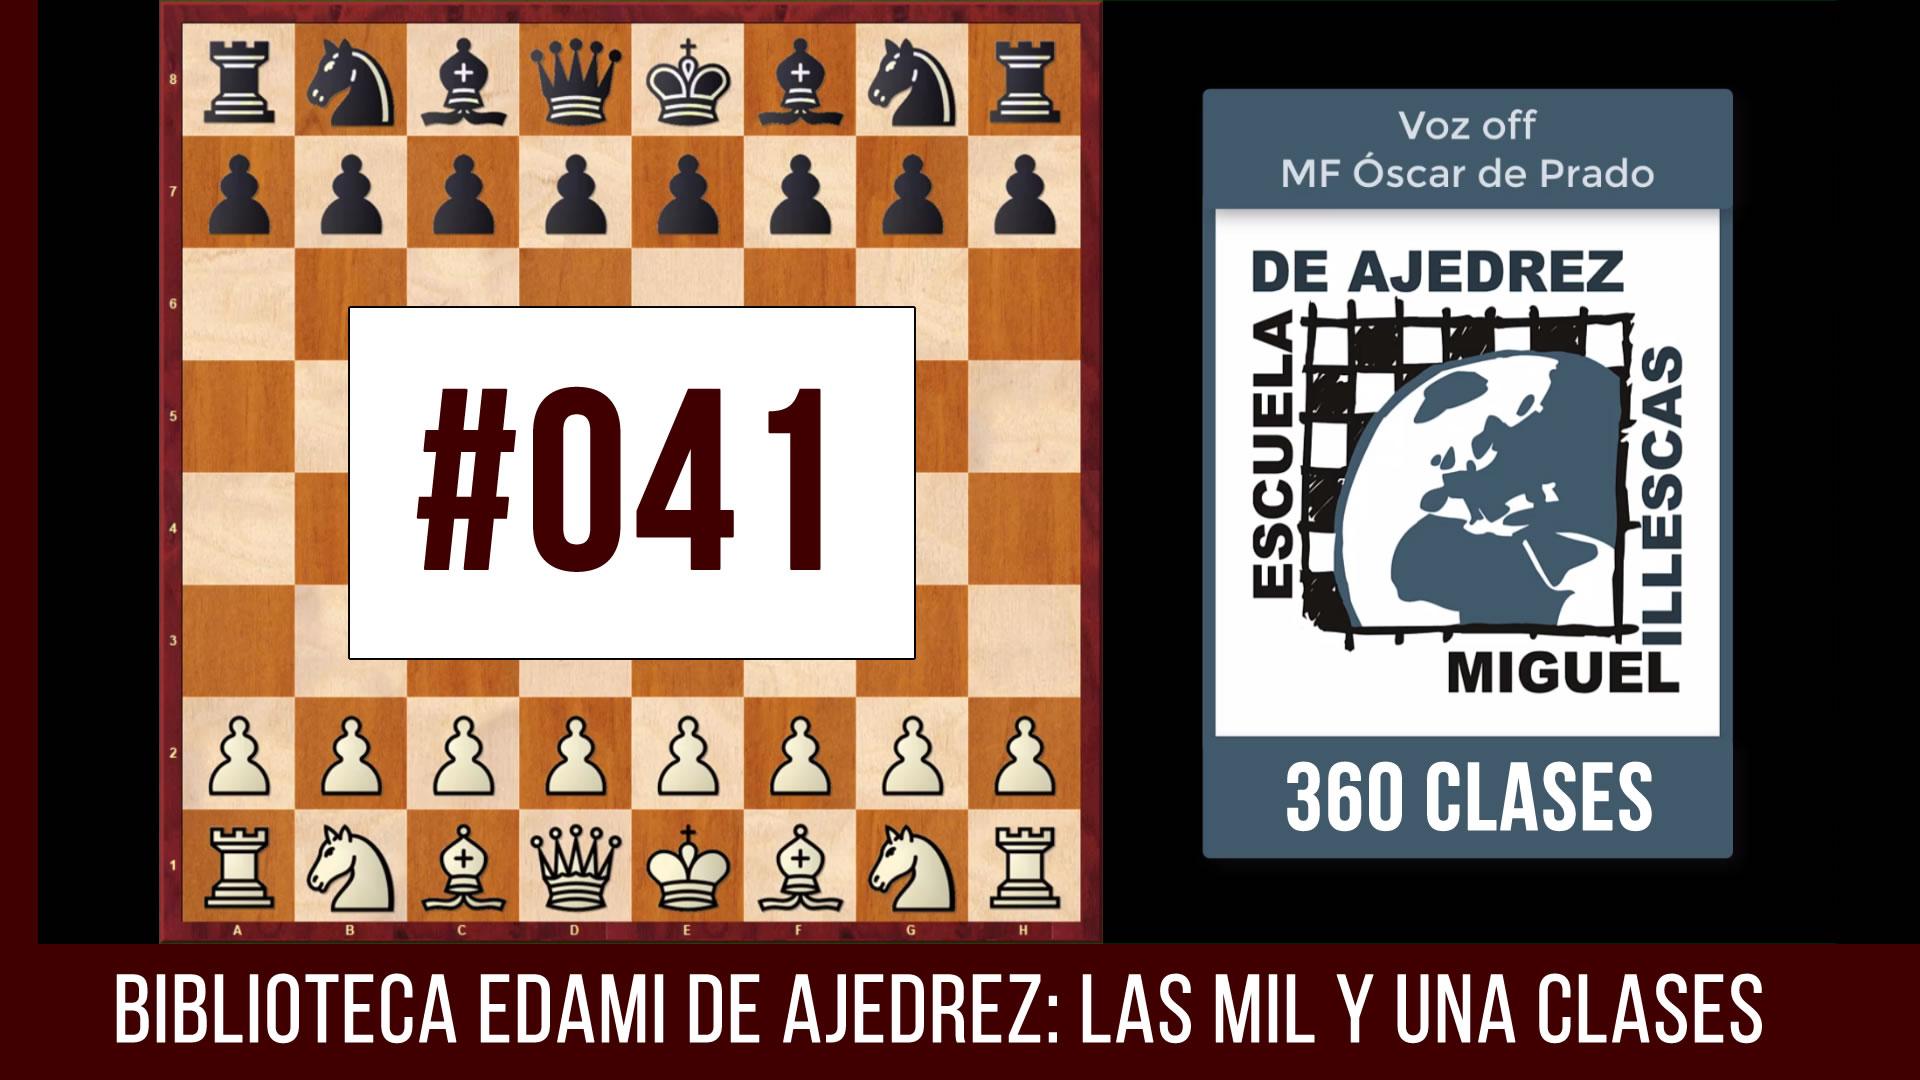 Clases de ajedrez #041 - EDAMI